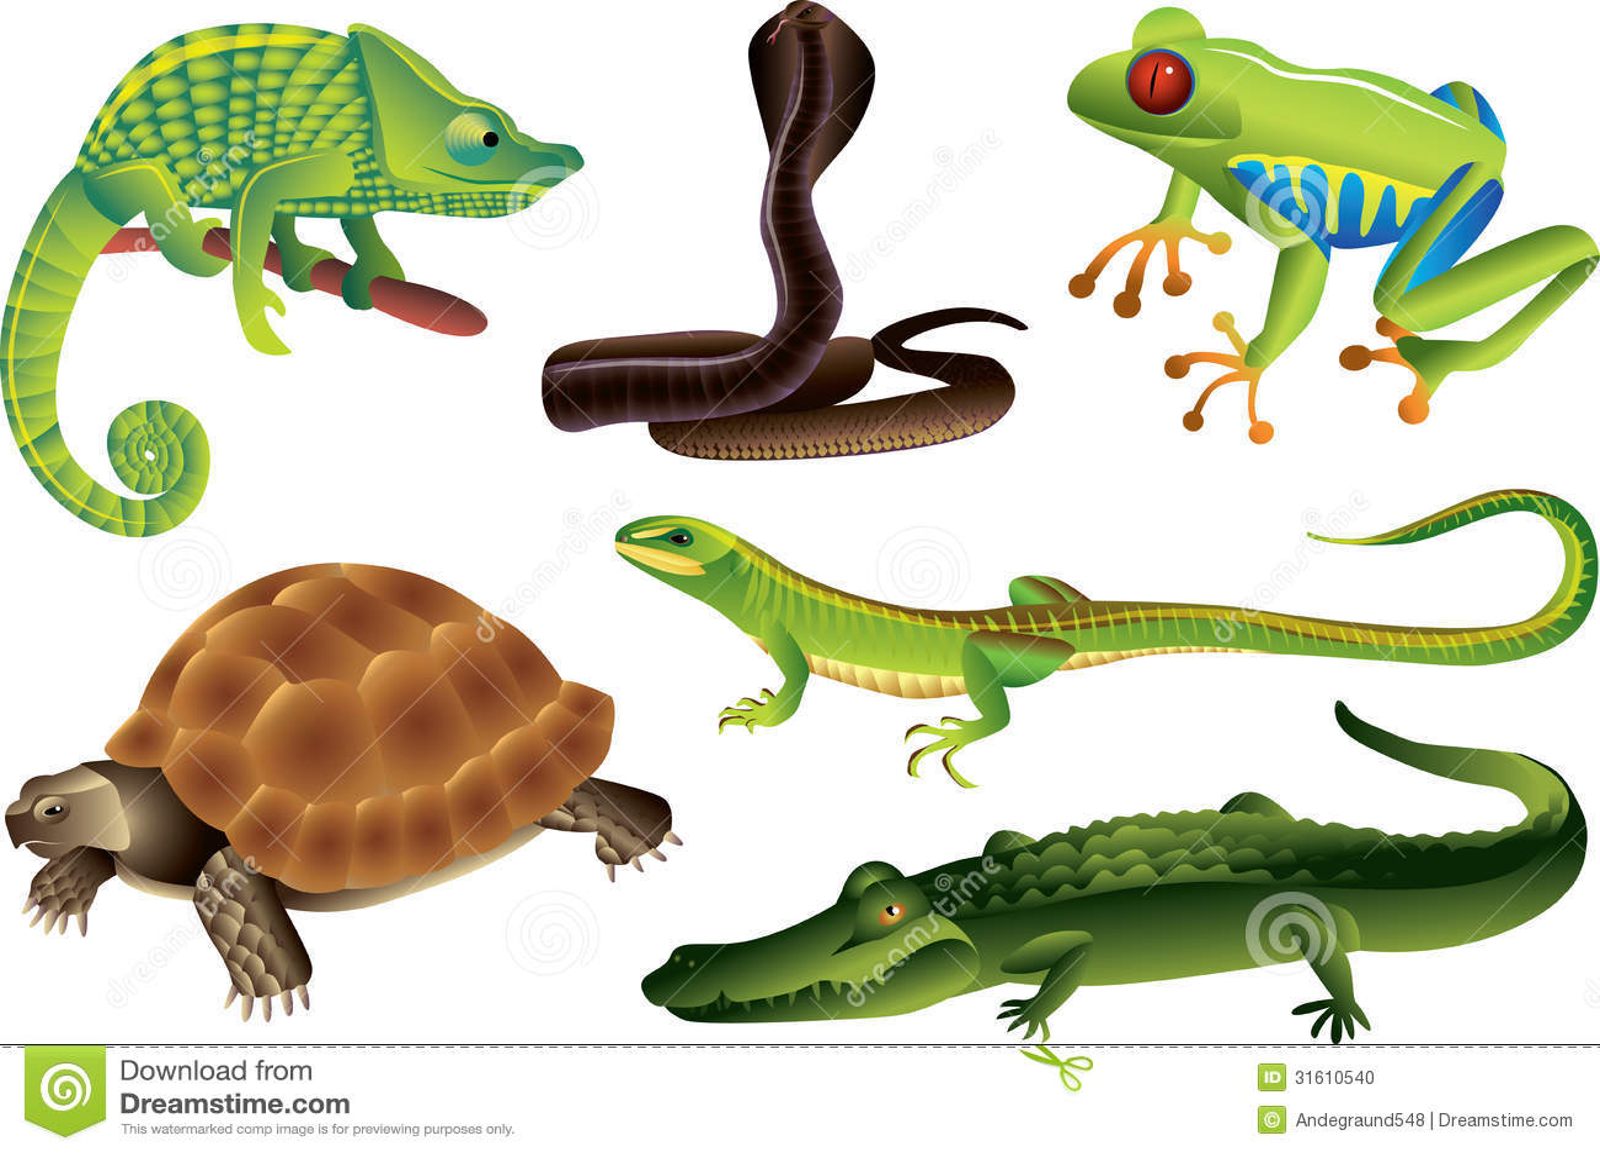 reptiles and amphibians set stock photo image 31610540 chameleon clipart black and white chameleon clip art free